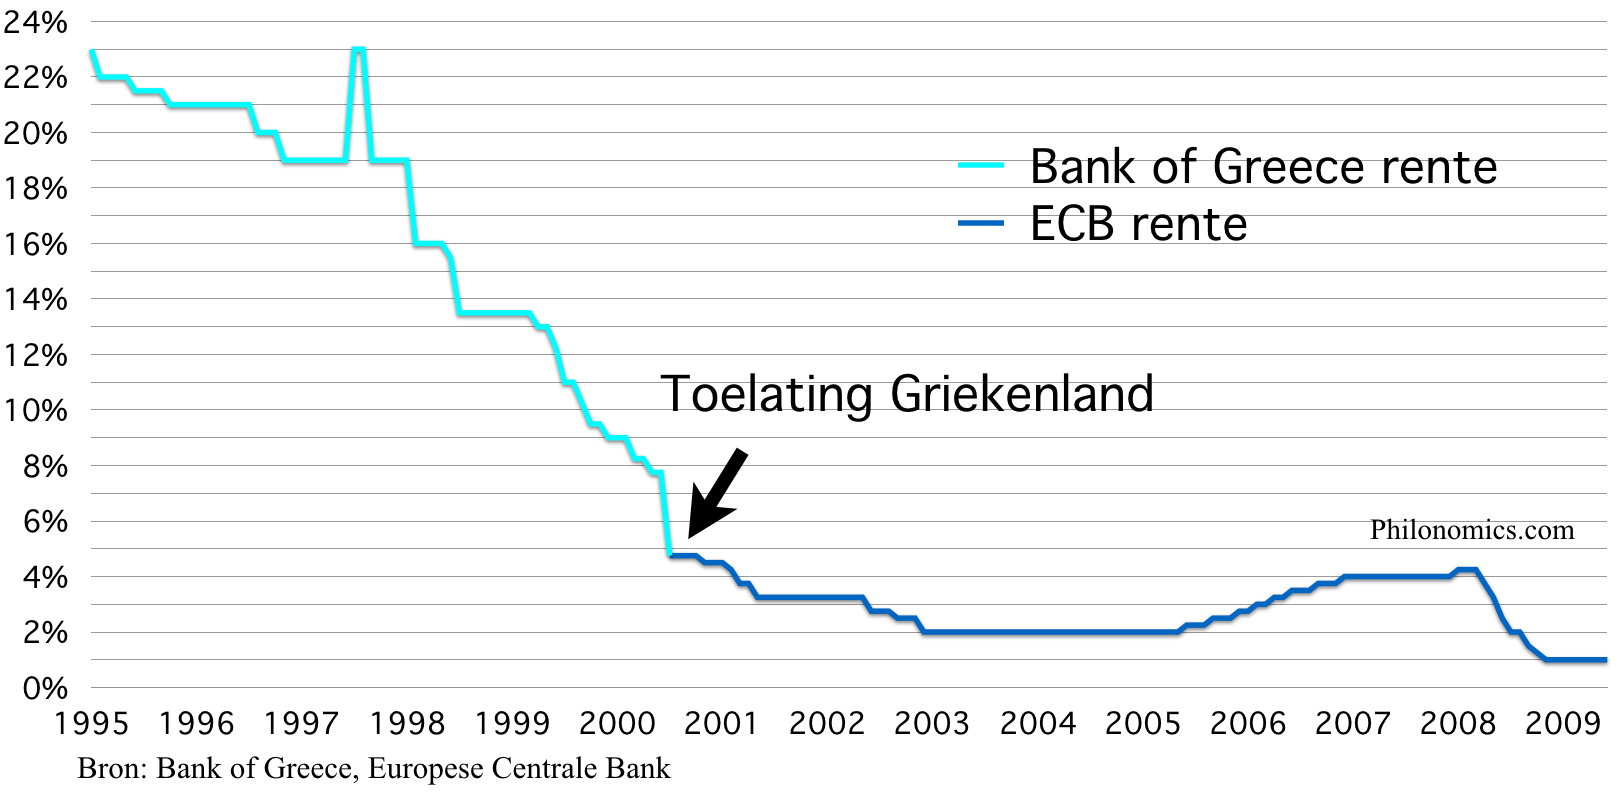 Centrale bank rente Griekenland Bank of Greece